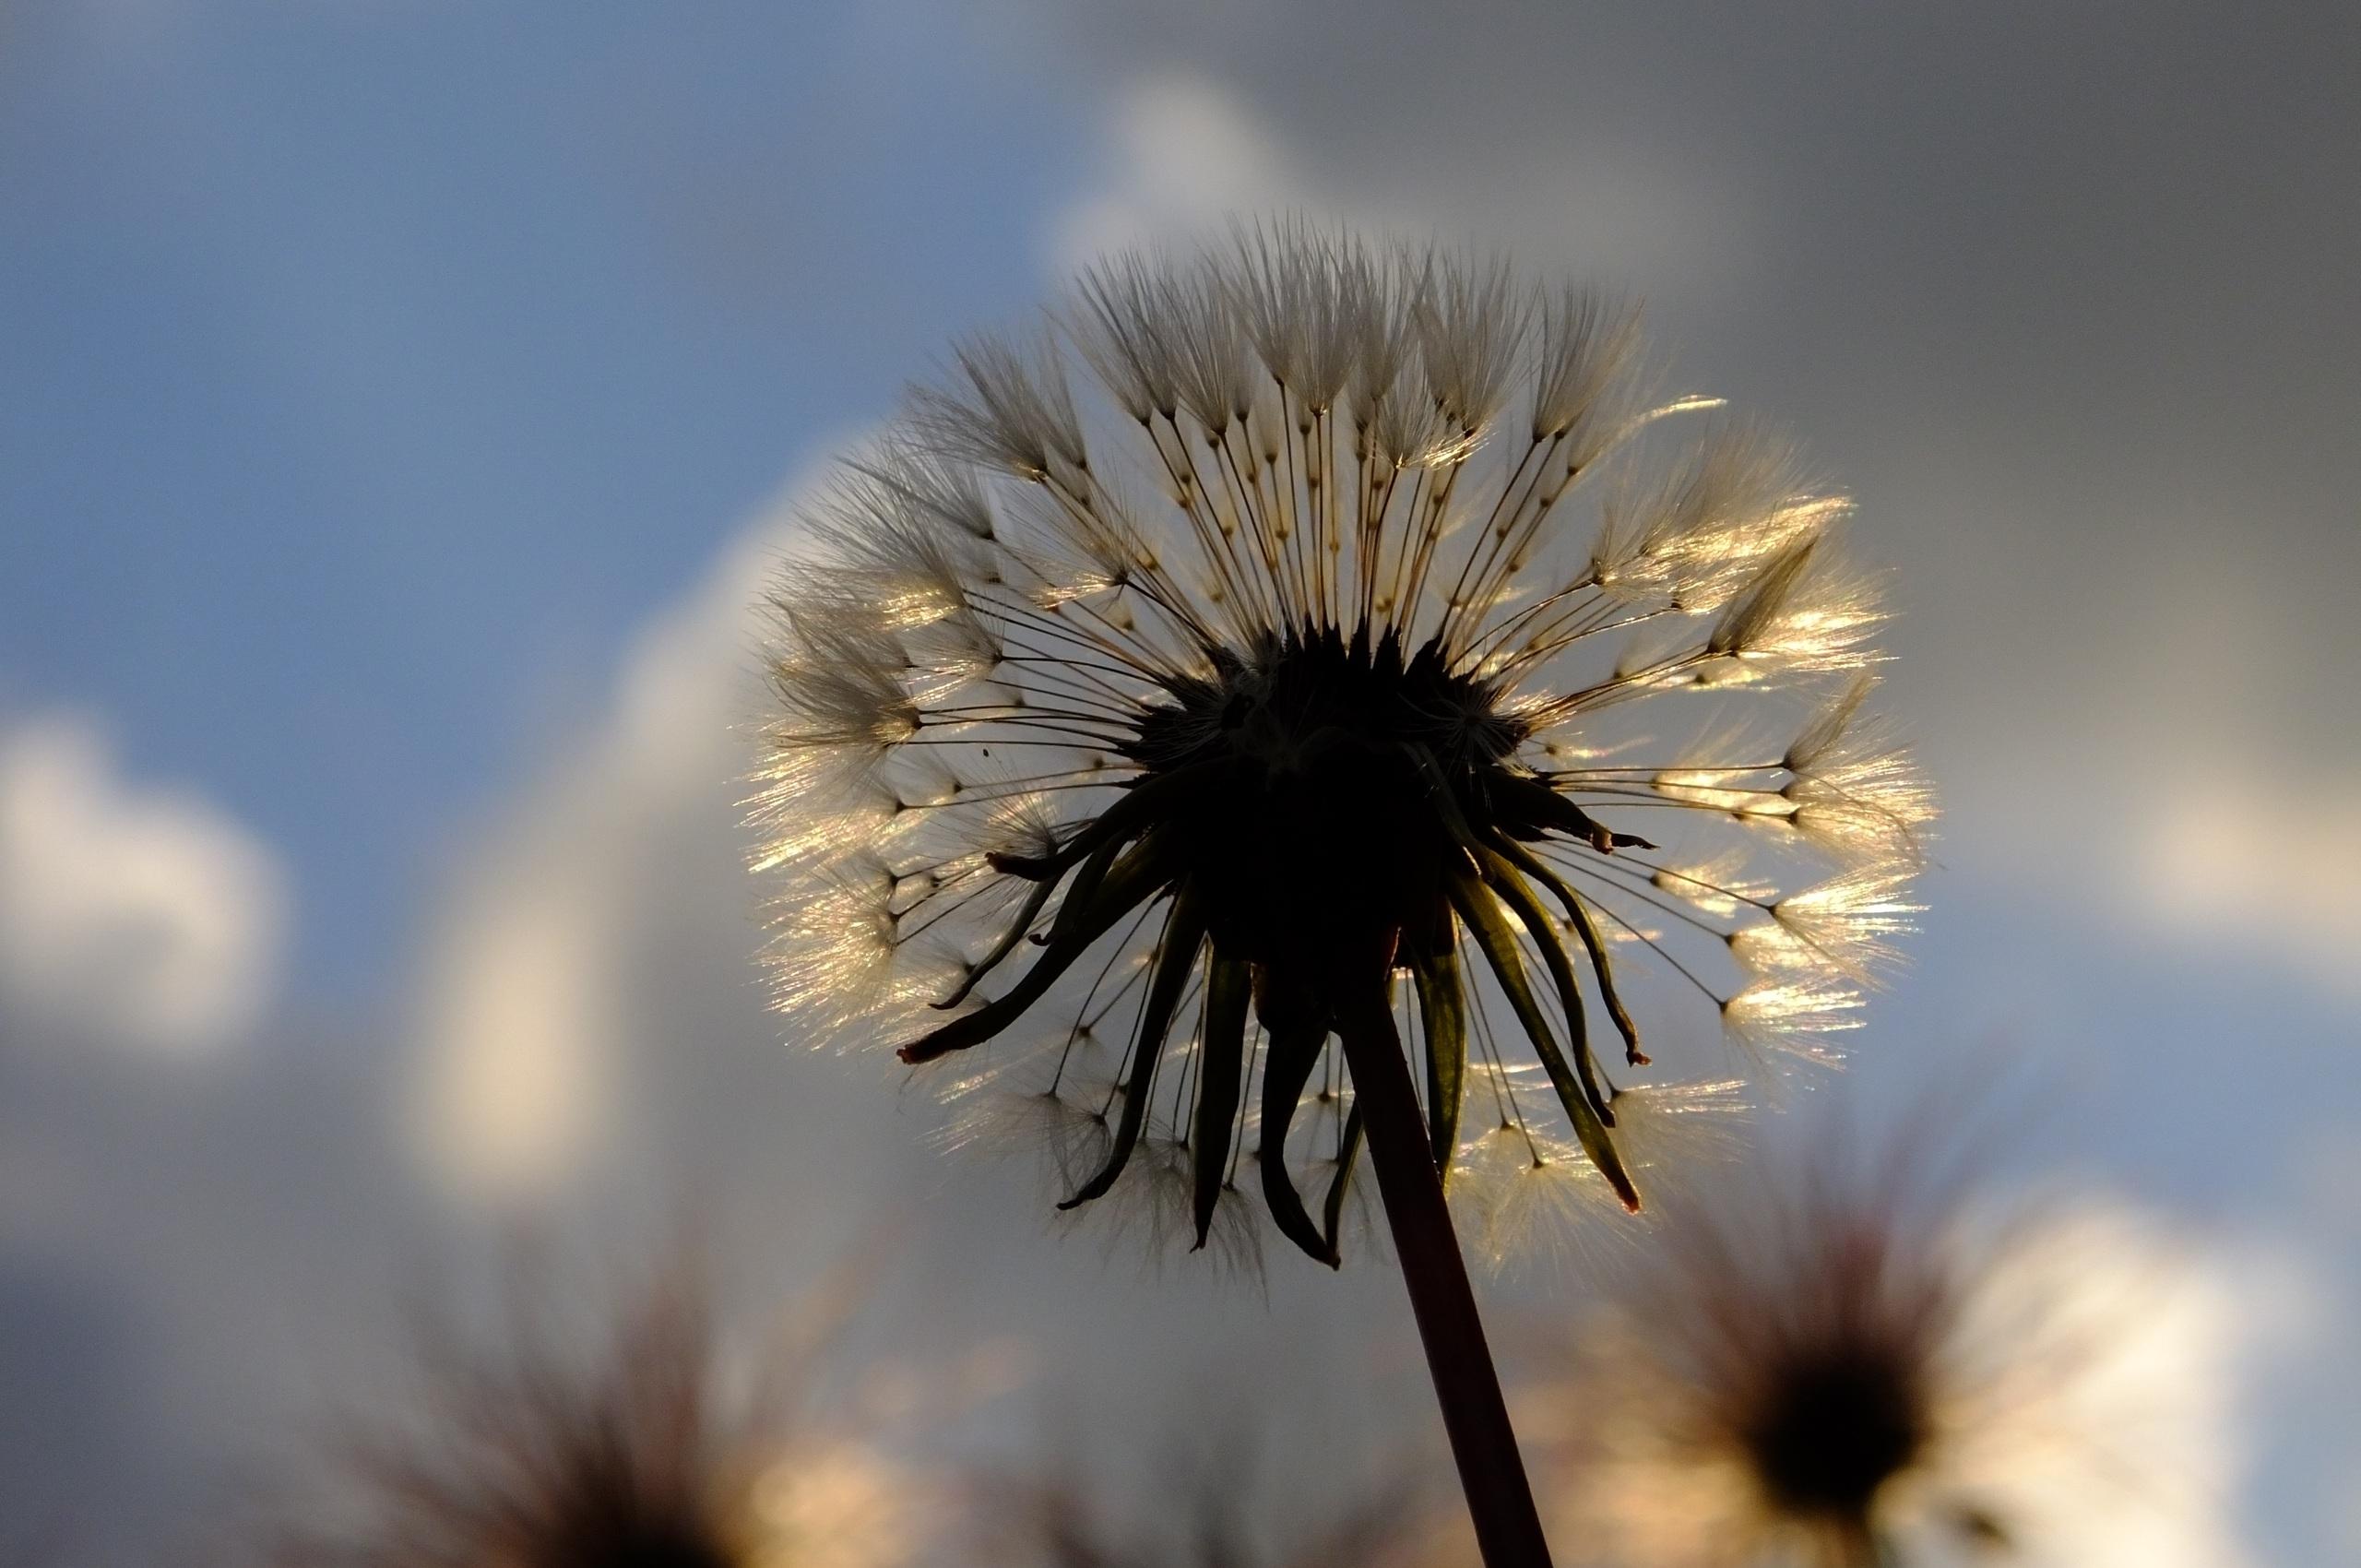 dandelion-plant-h5.jpg